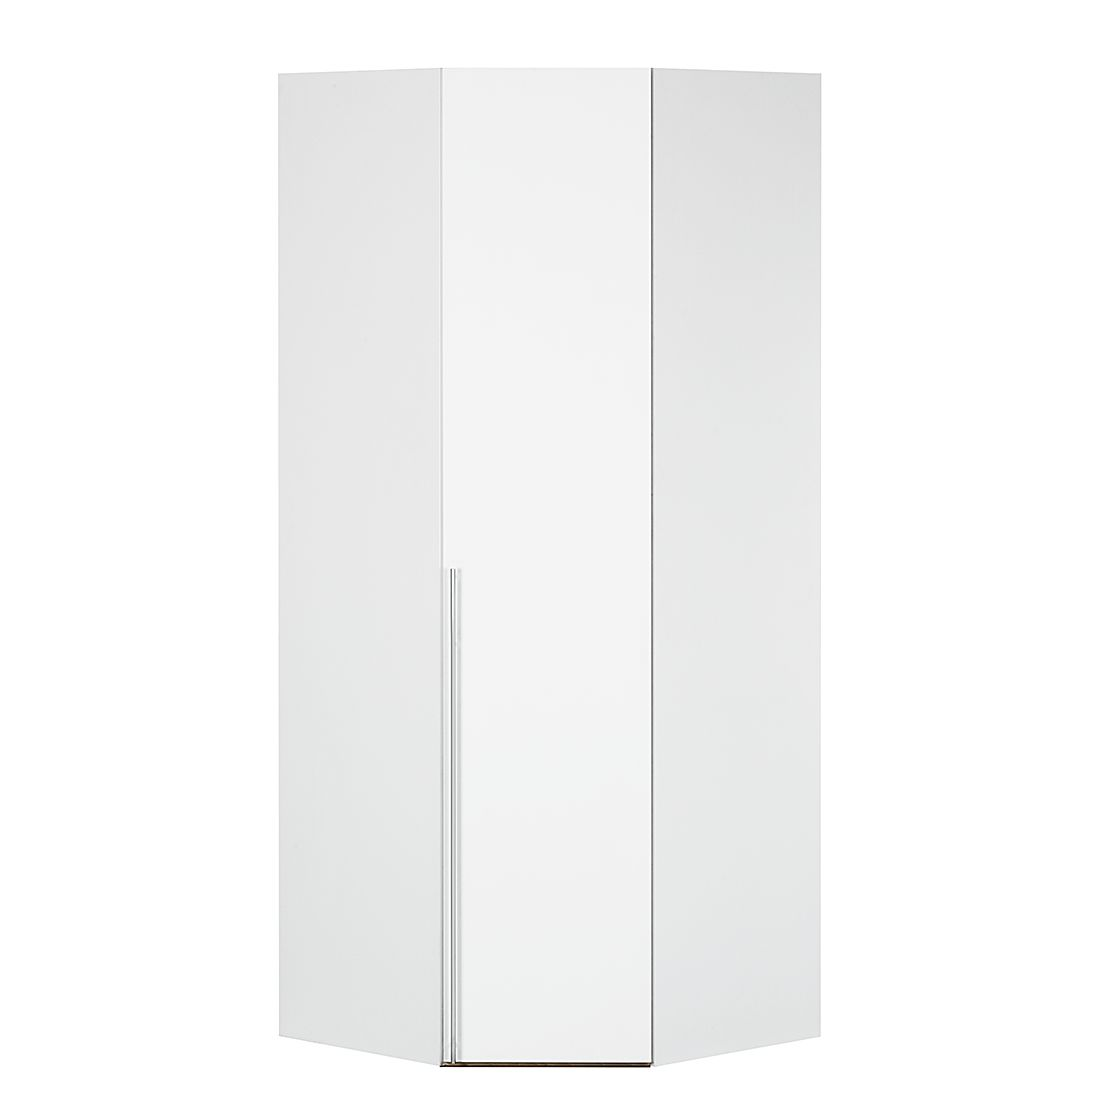 Armoire d'angle Brooklyn I - Blanc polaire - 216 cm, Express Möbel